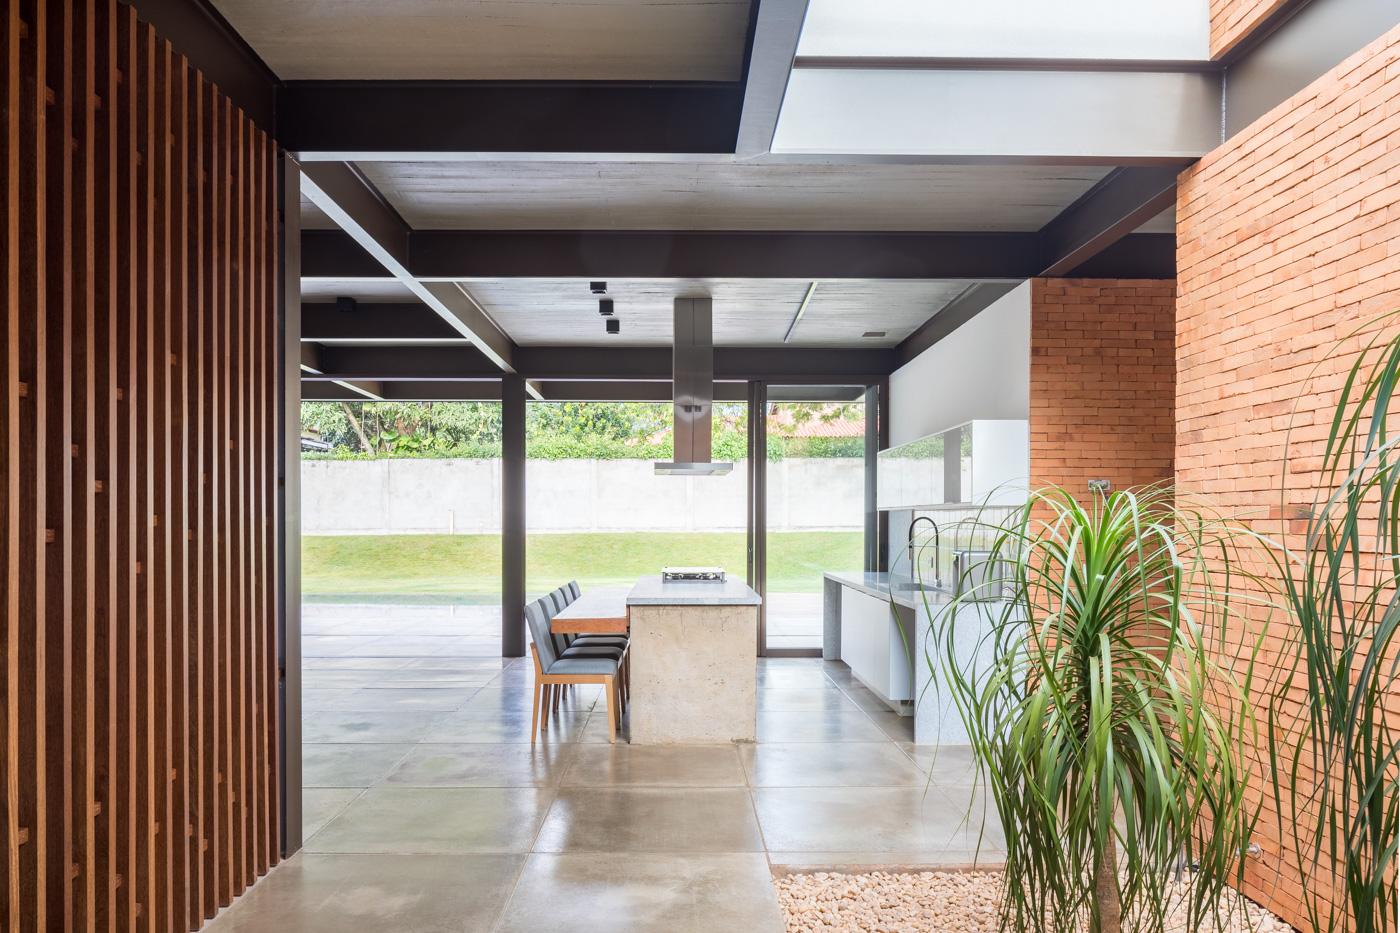 Estúdio-Mova-arquitetura-interiores-comercial-foto-haruo-mikami_179-HDR_Baixa.jpg